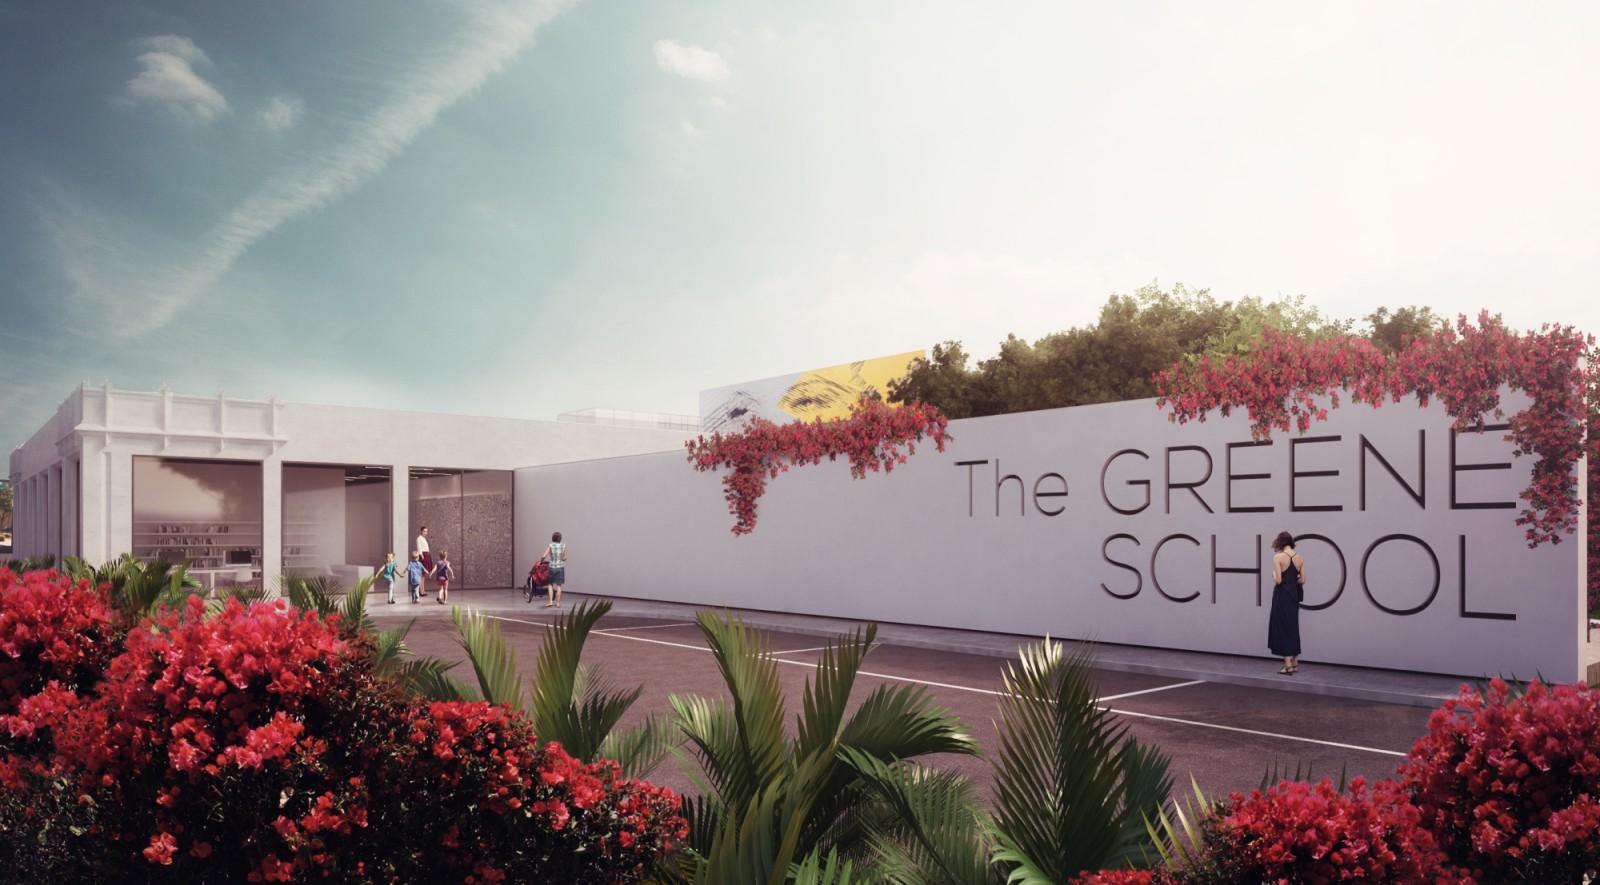 School in West Palm Beach